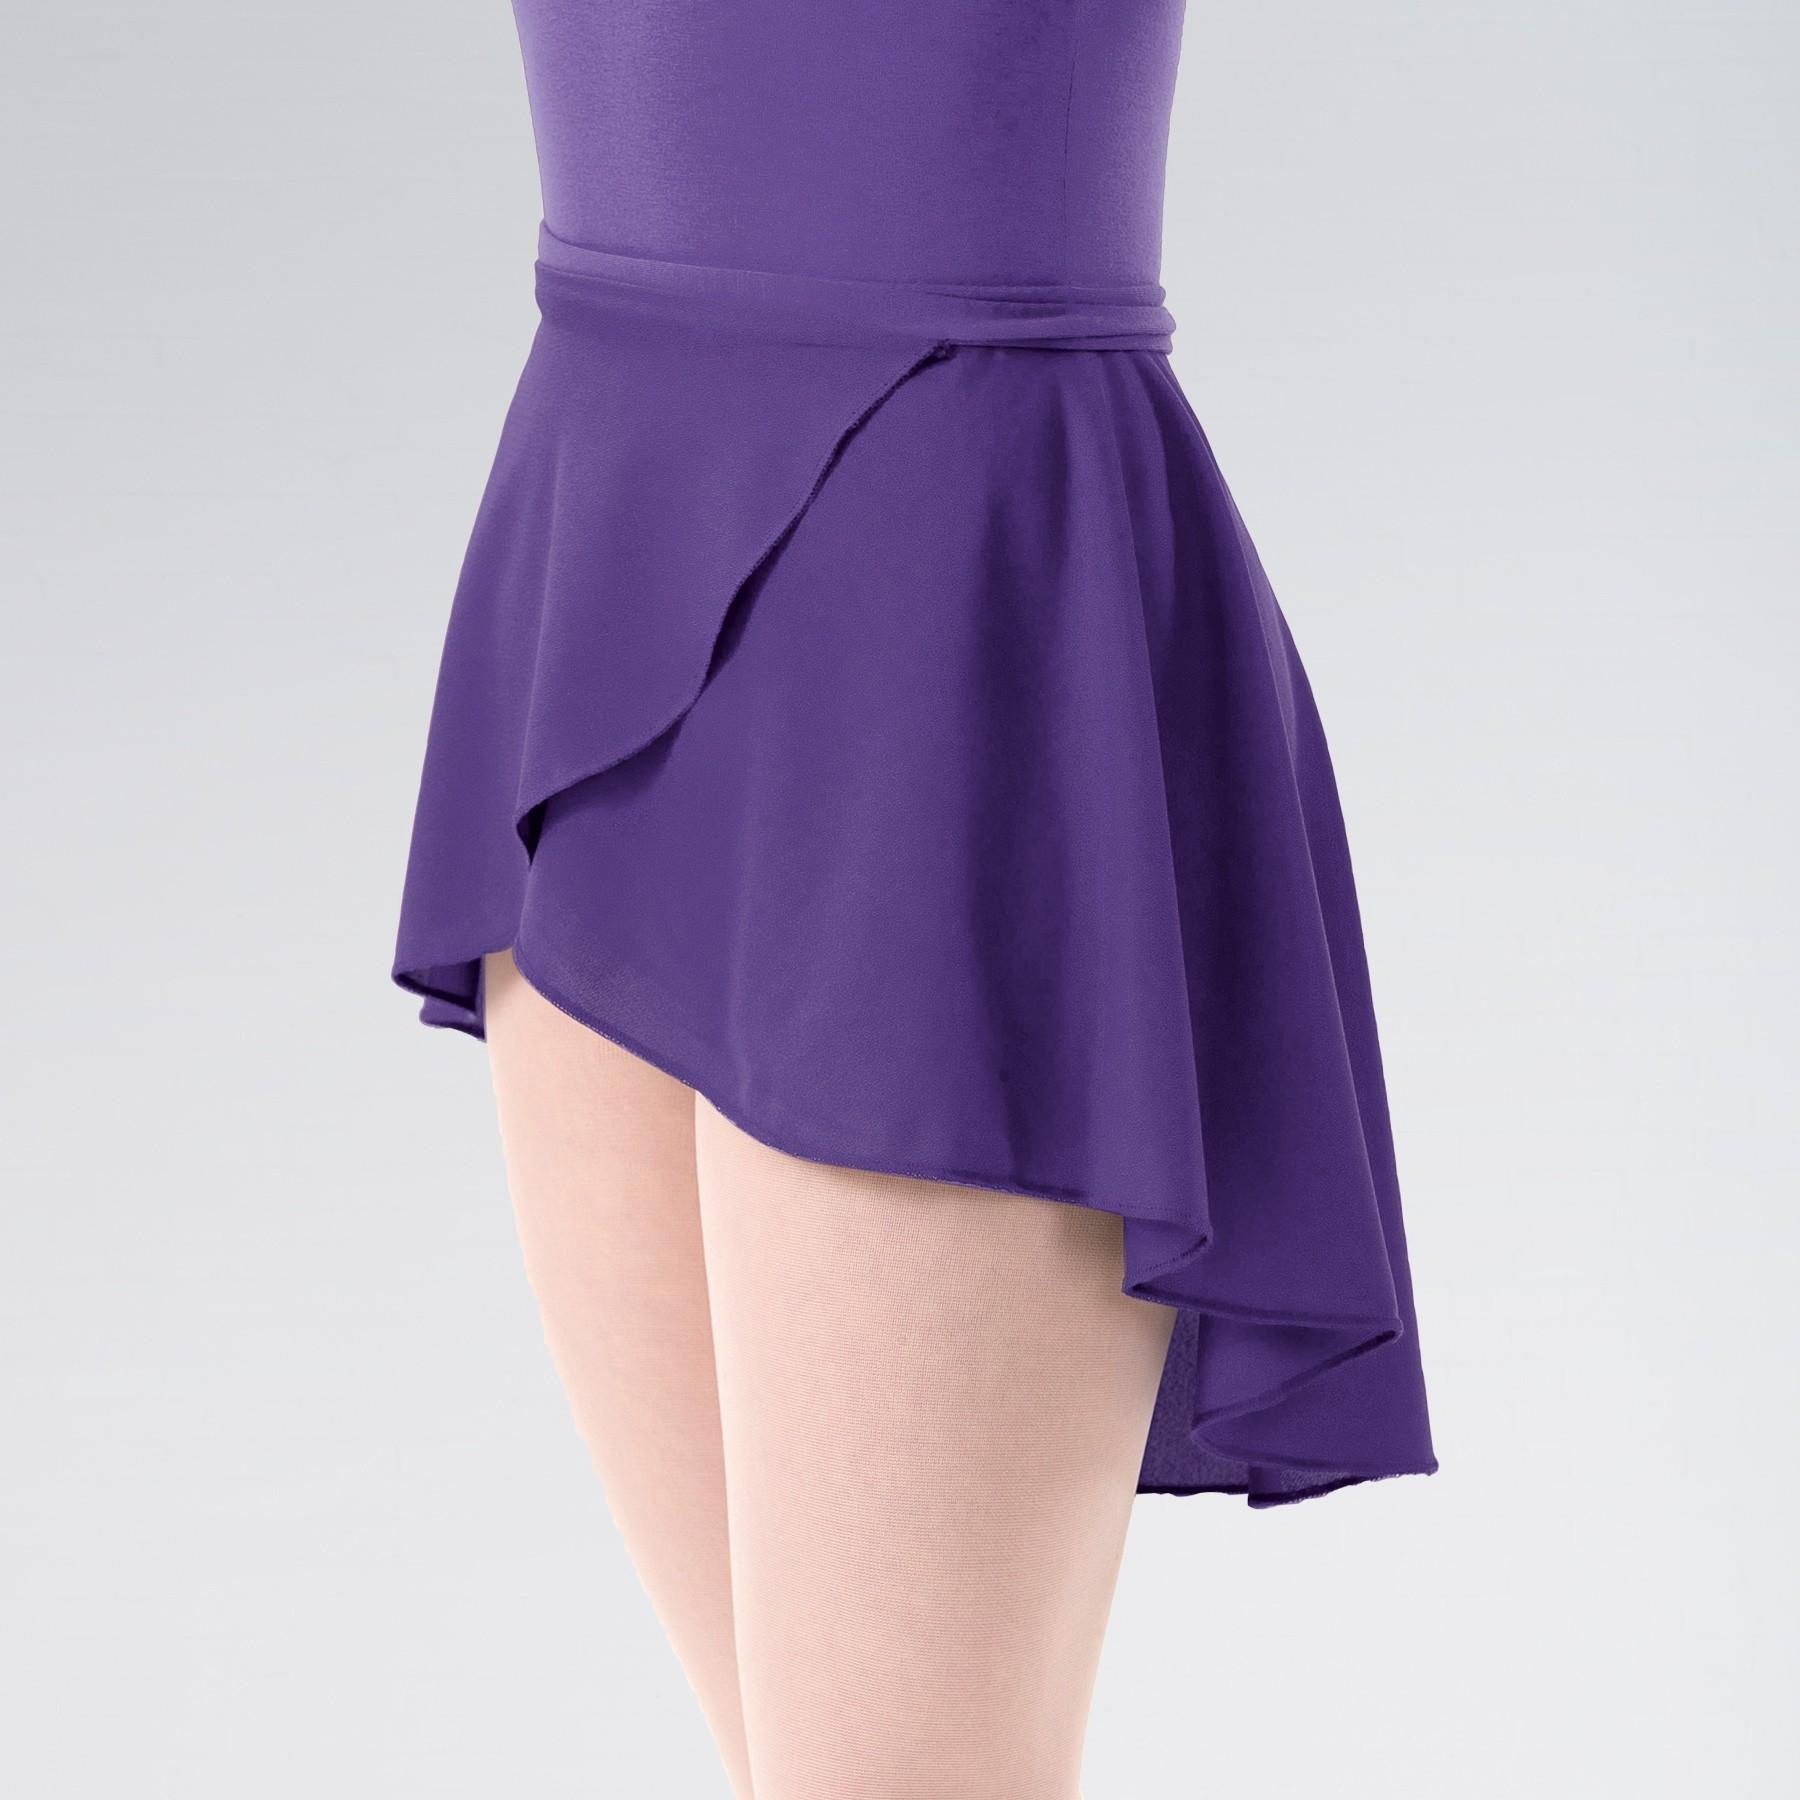 Adagio ISTD Wrapover Skirt (Purple)